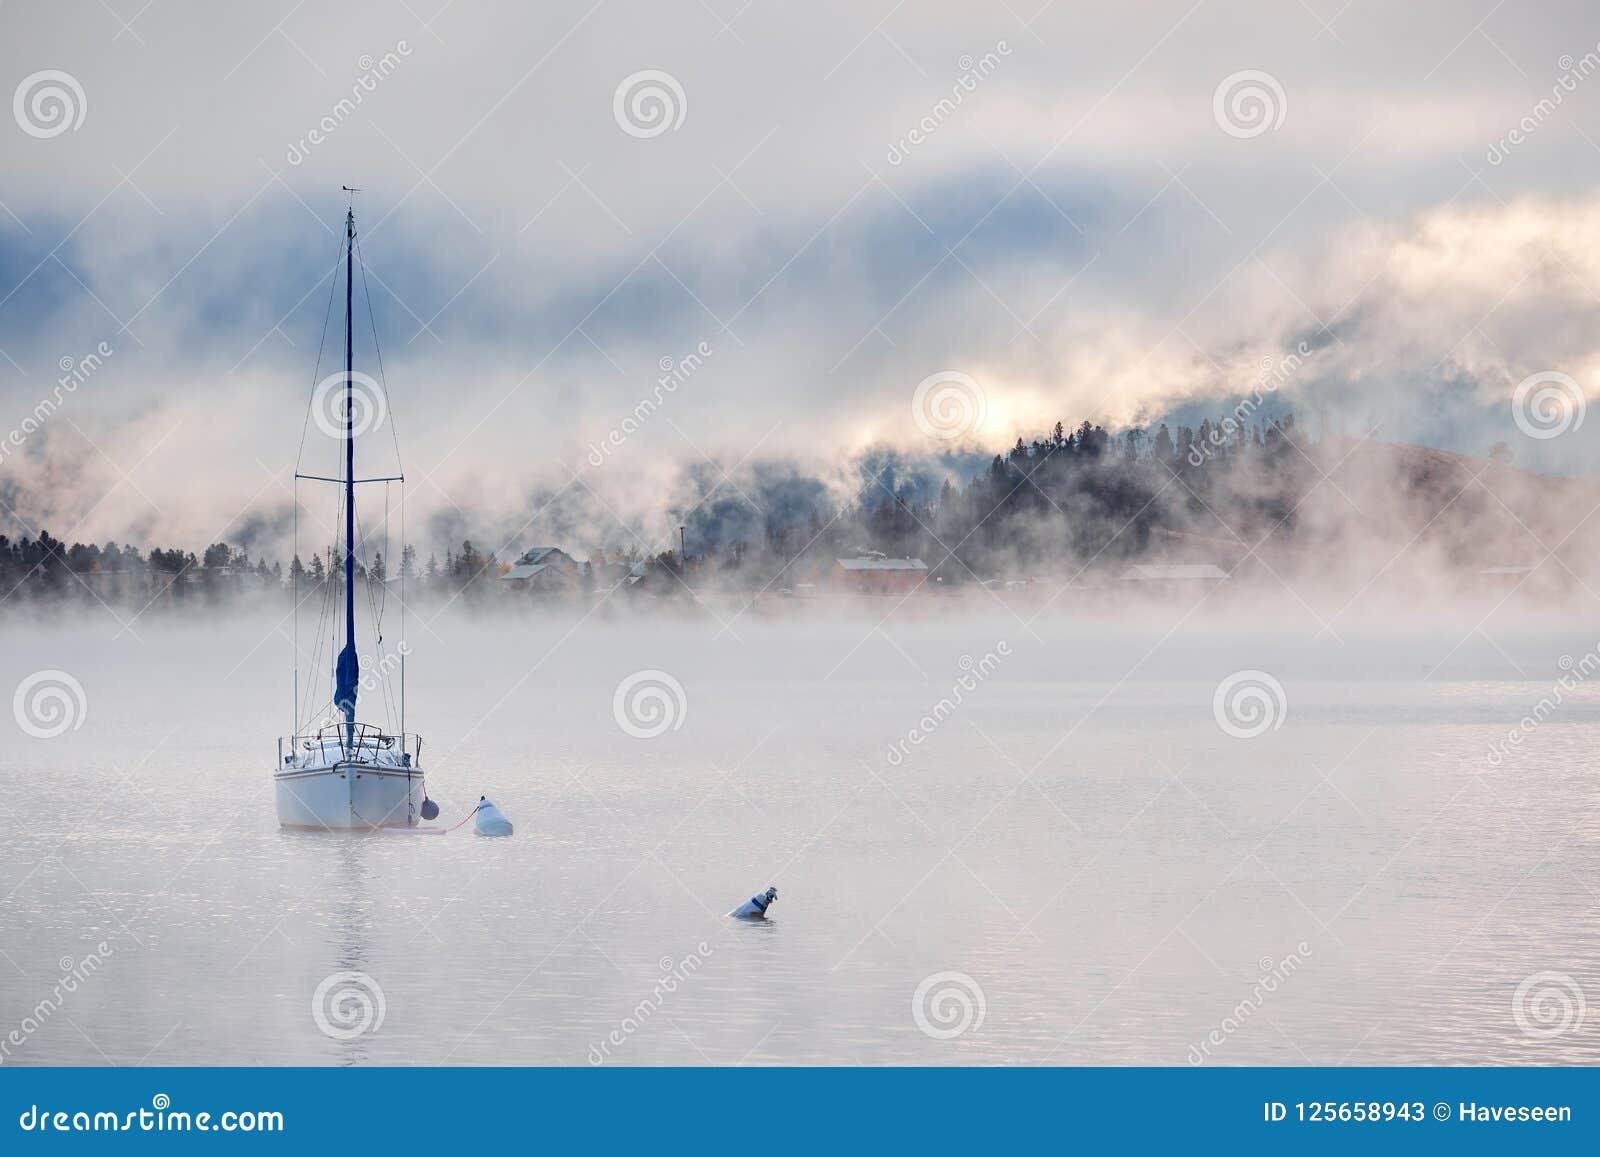 Foggy Misty Lake Landscape In Colorado Usa Stock Image Image Of